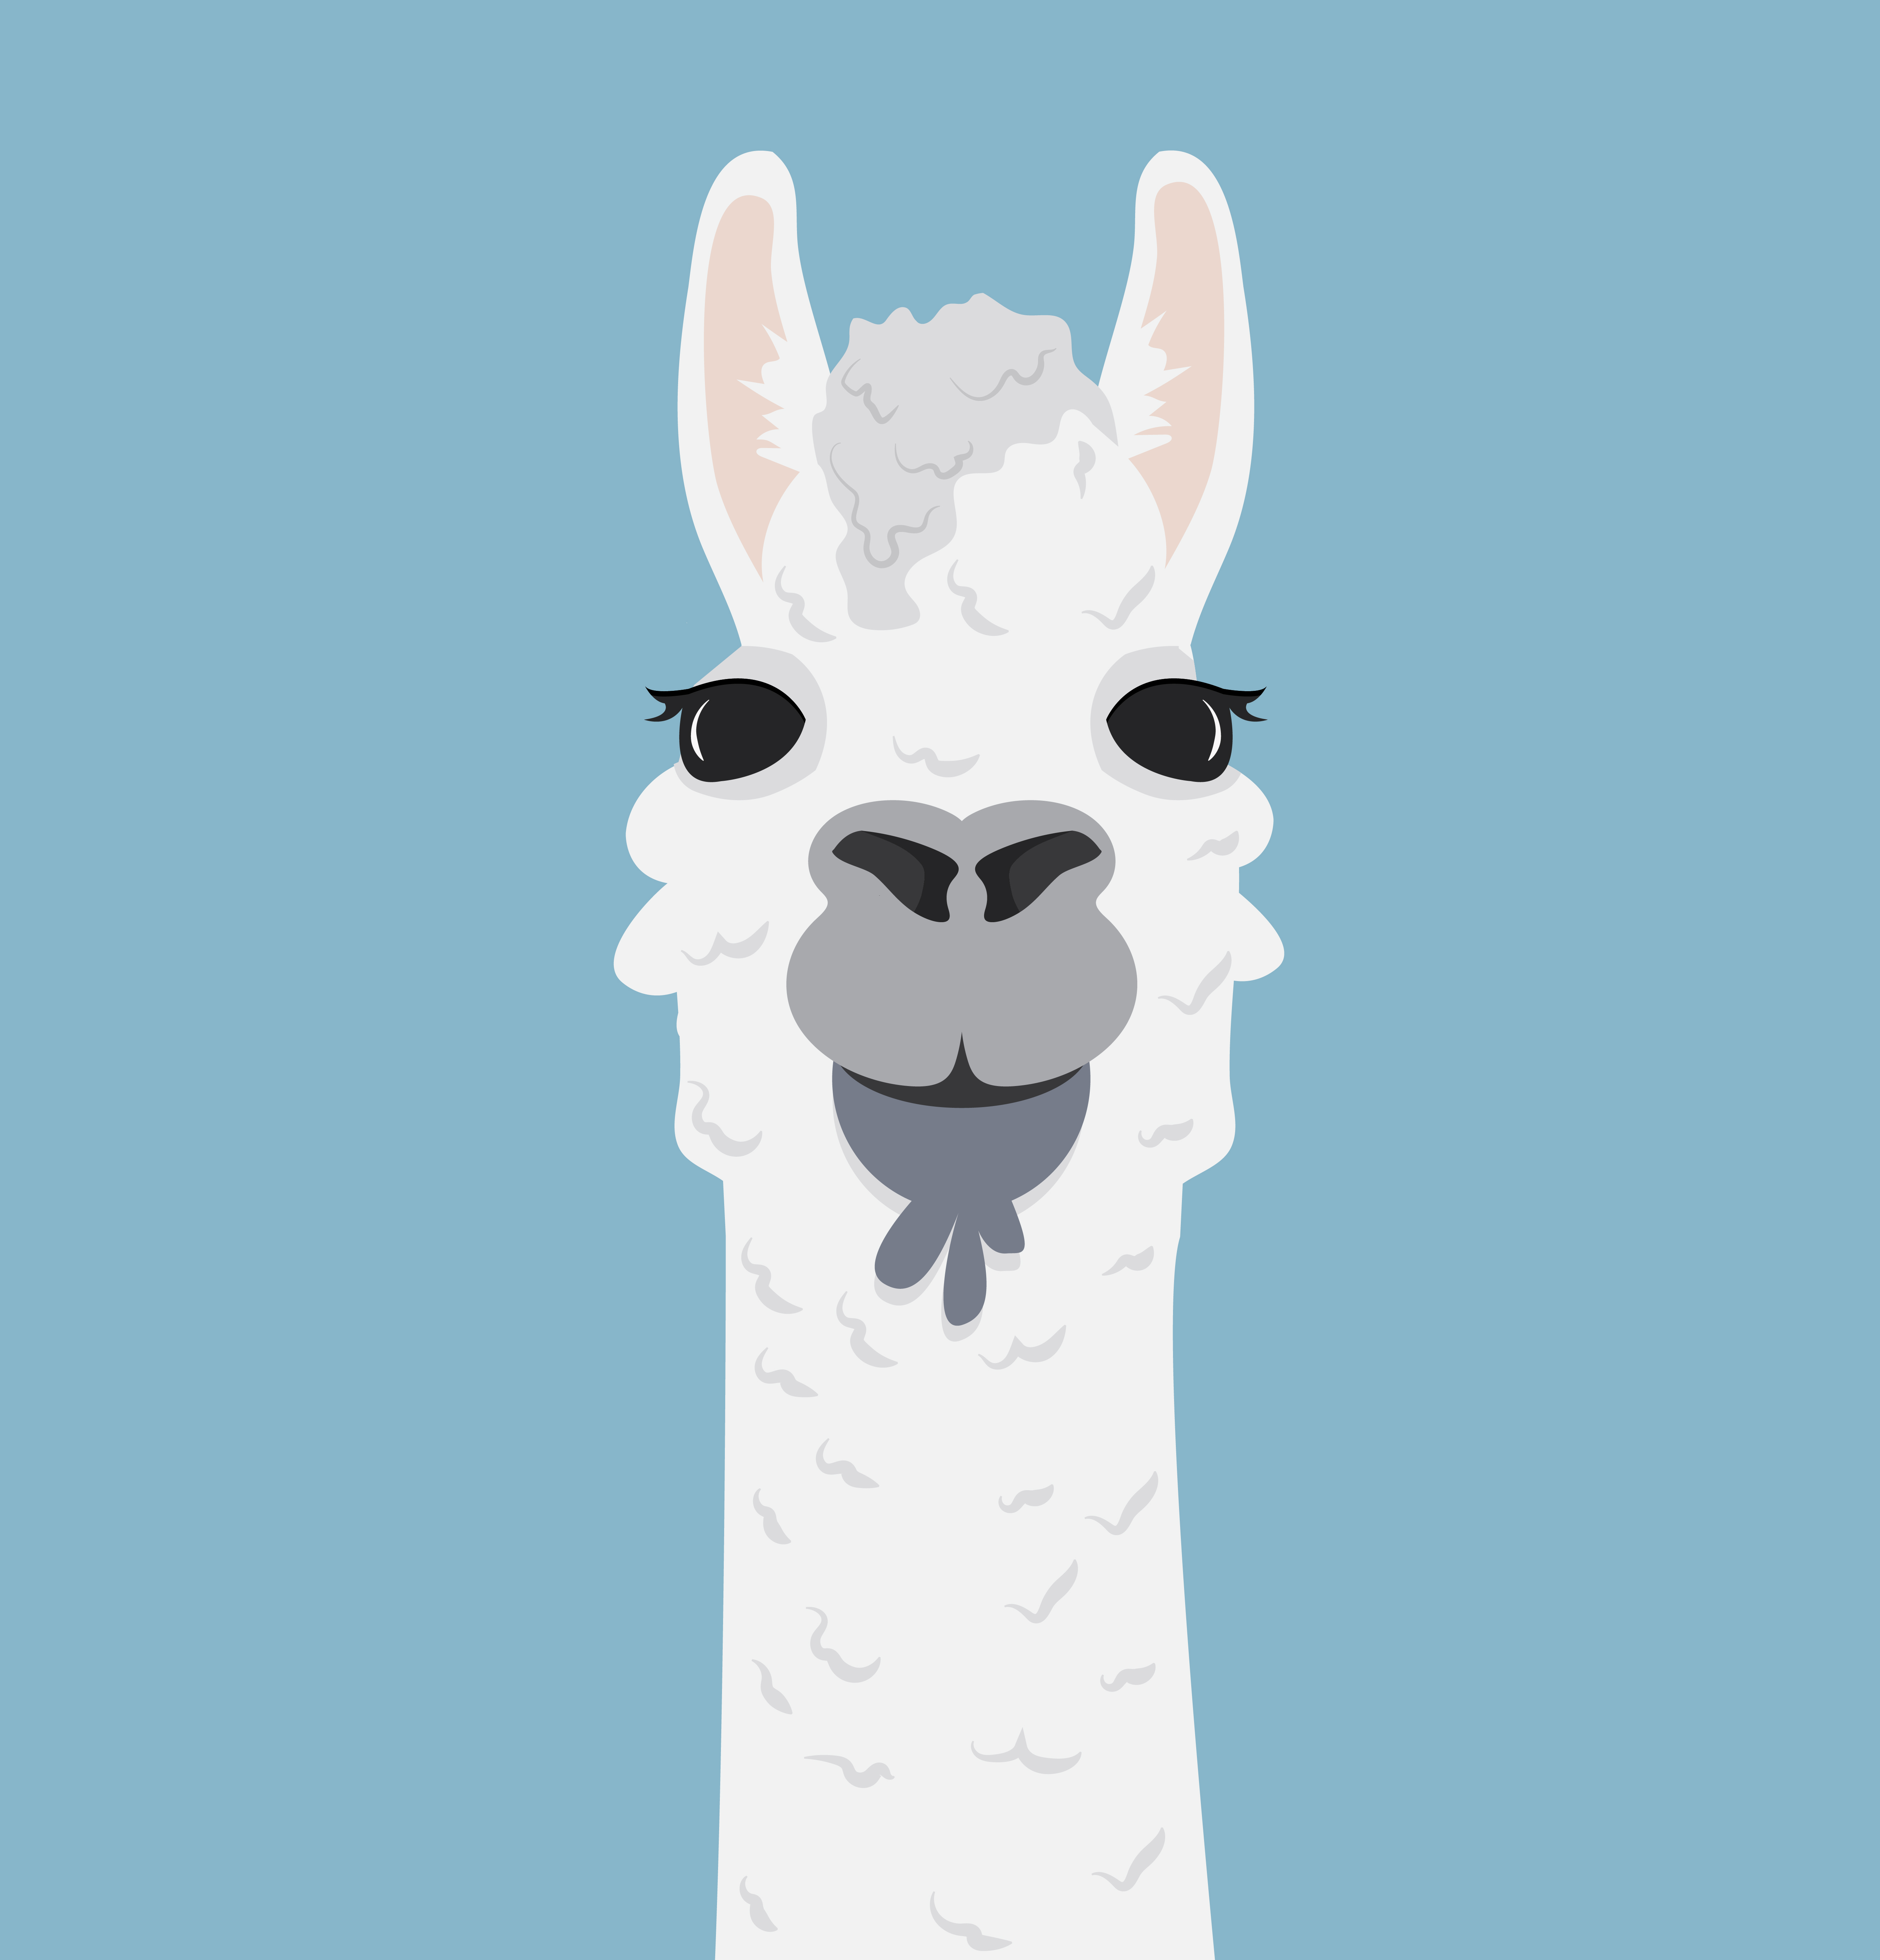 Alpaca lama portrait Vector Illustration - Download Free ...